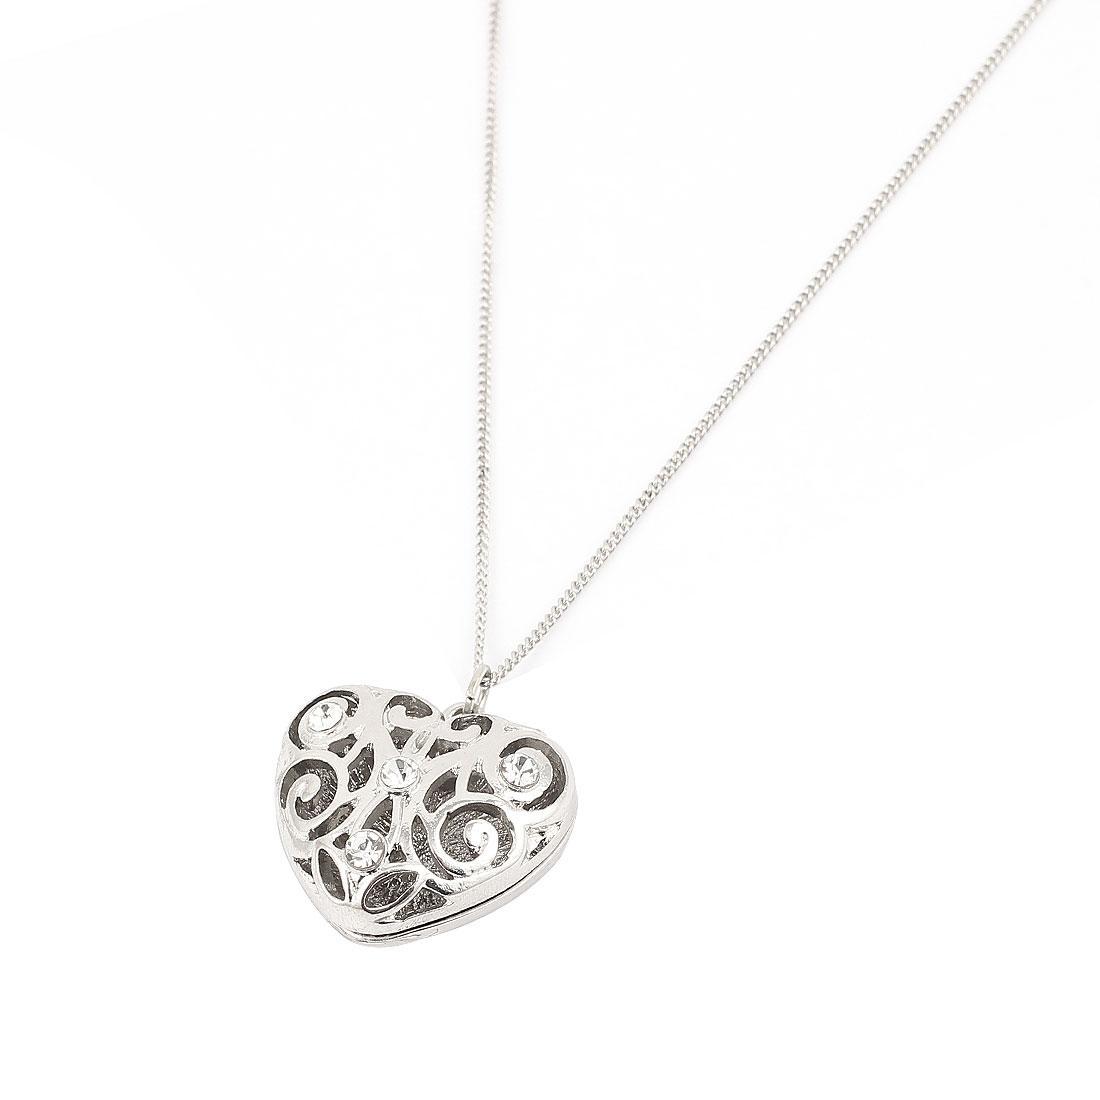 Silver Tone Plastic Crystals Decor Heart Shape Pendant Metal Necklace Neck Lace Neckwear for Women